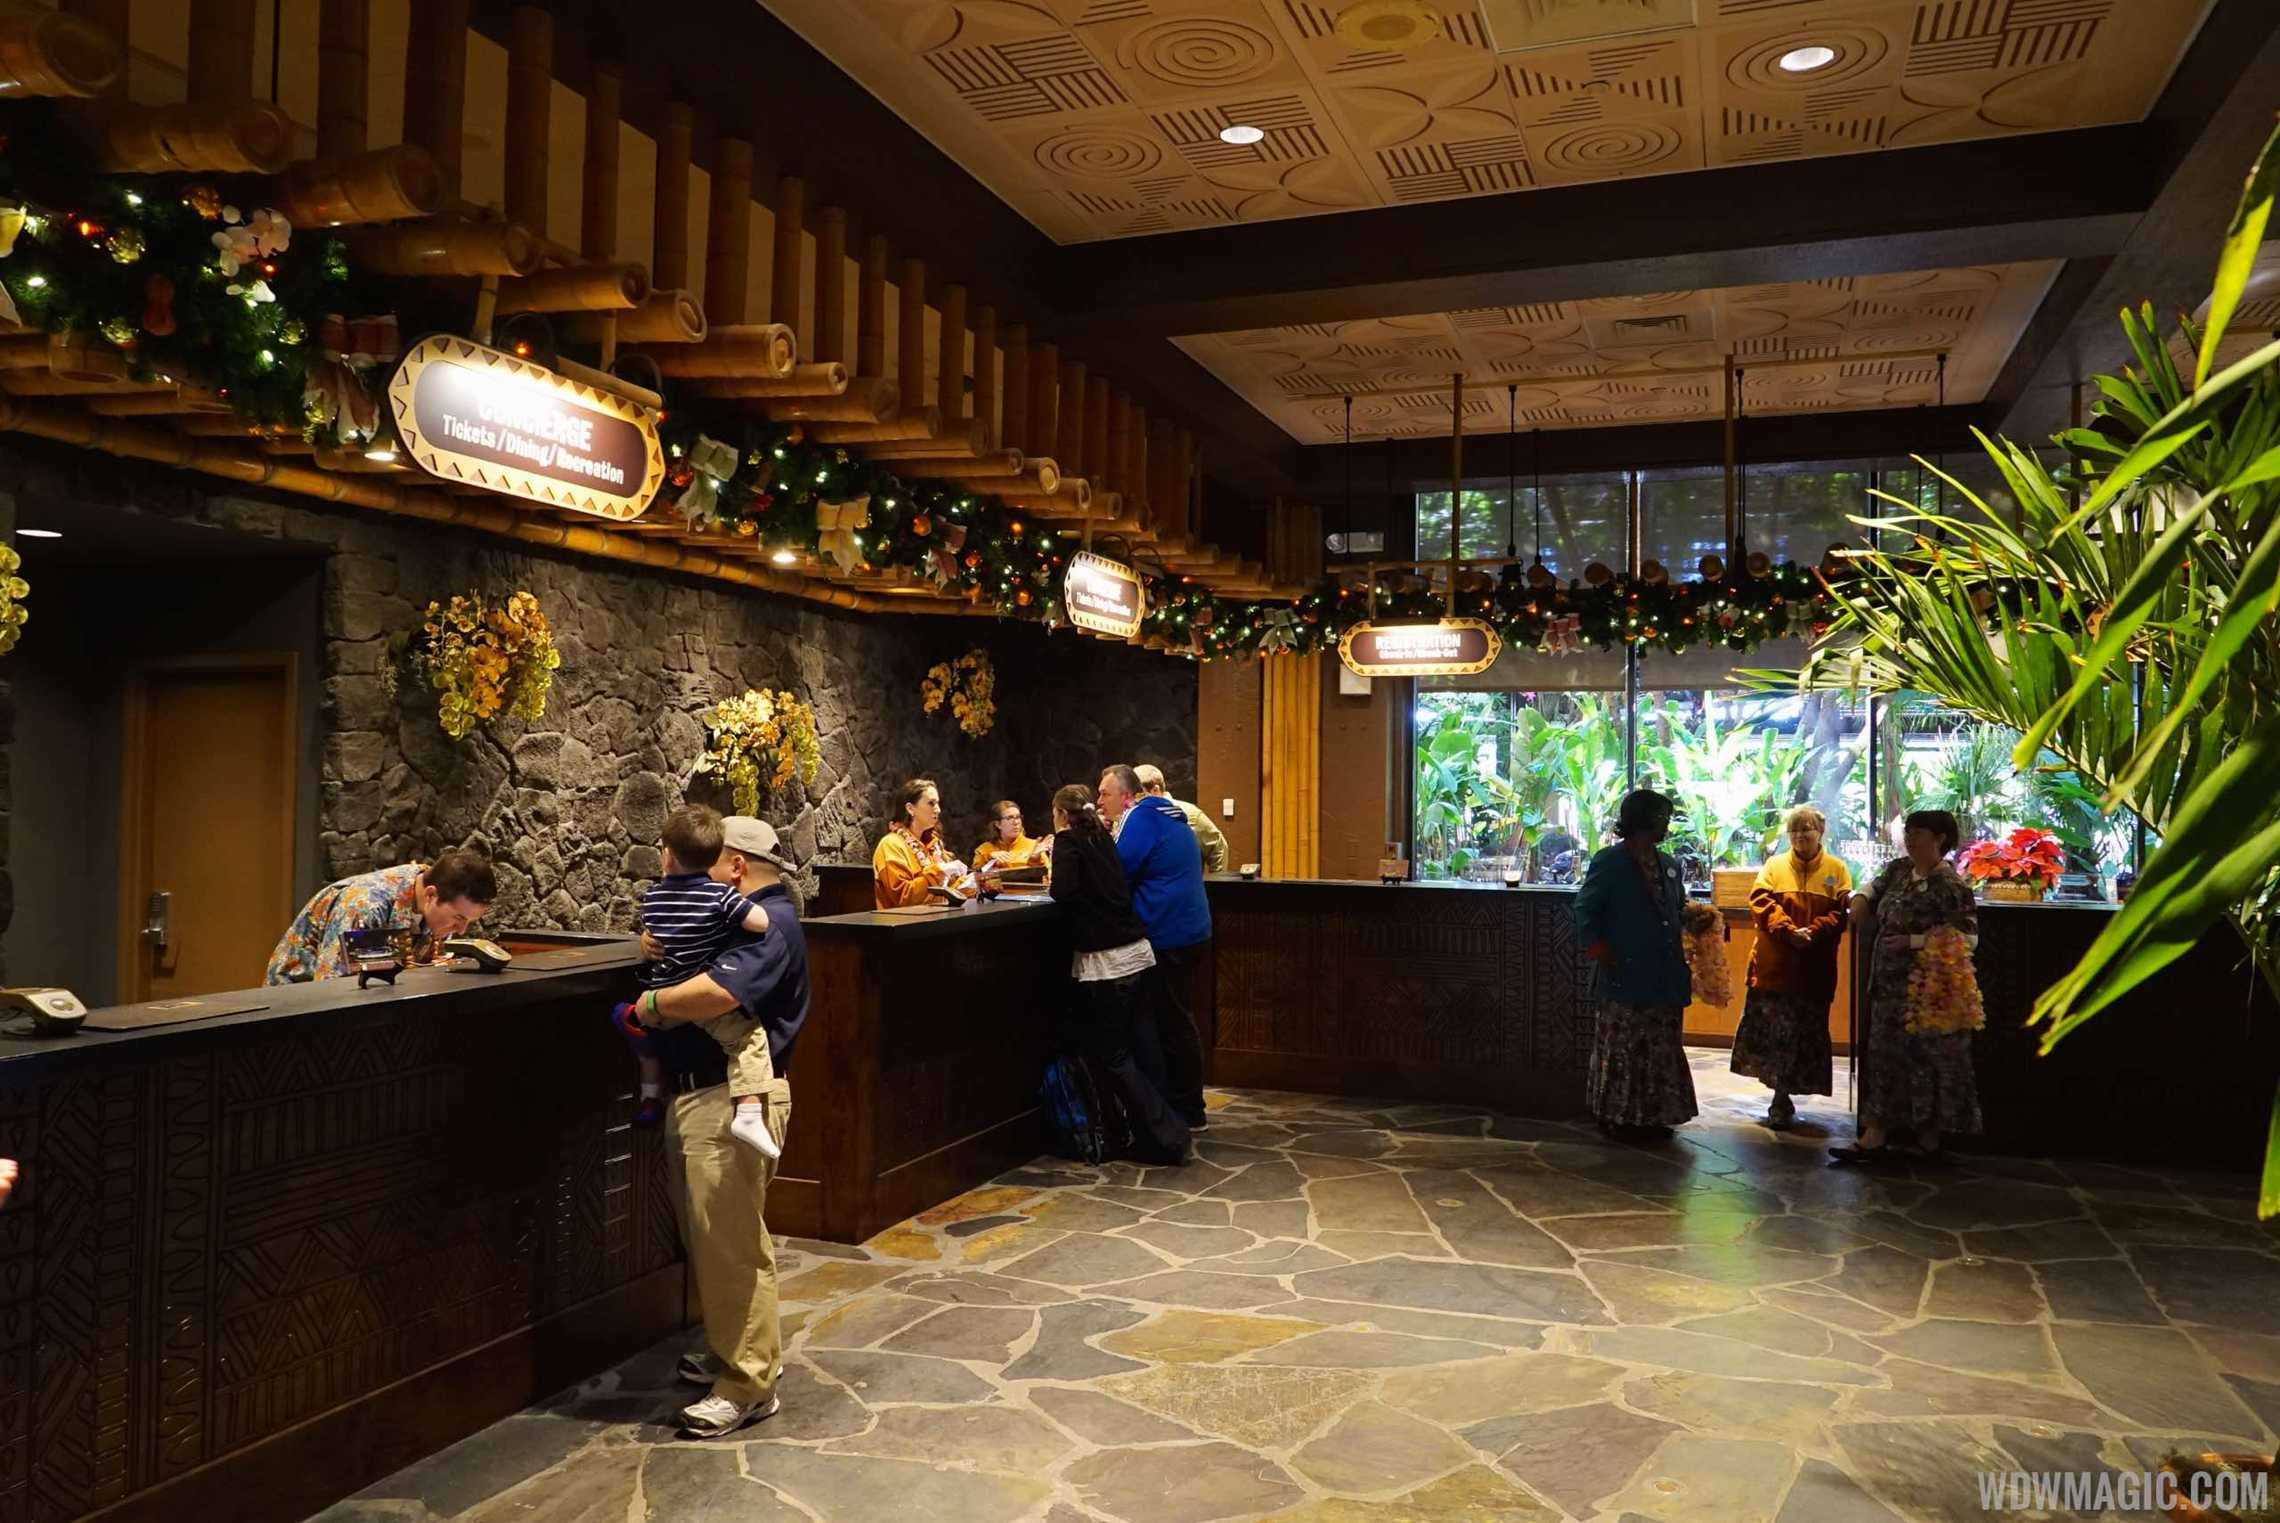 New Polynesian Resort check in desks